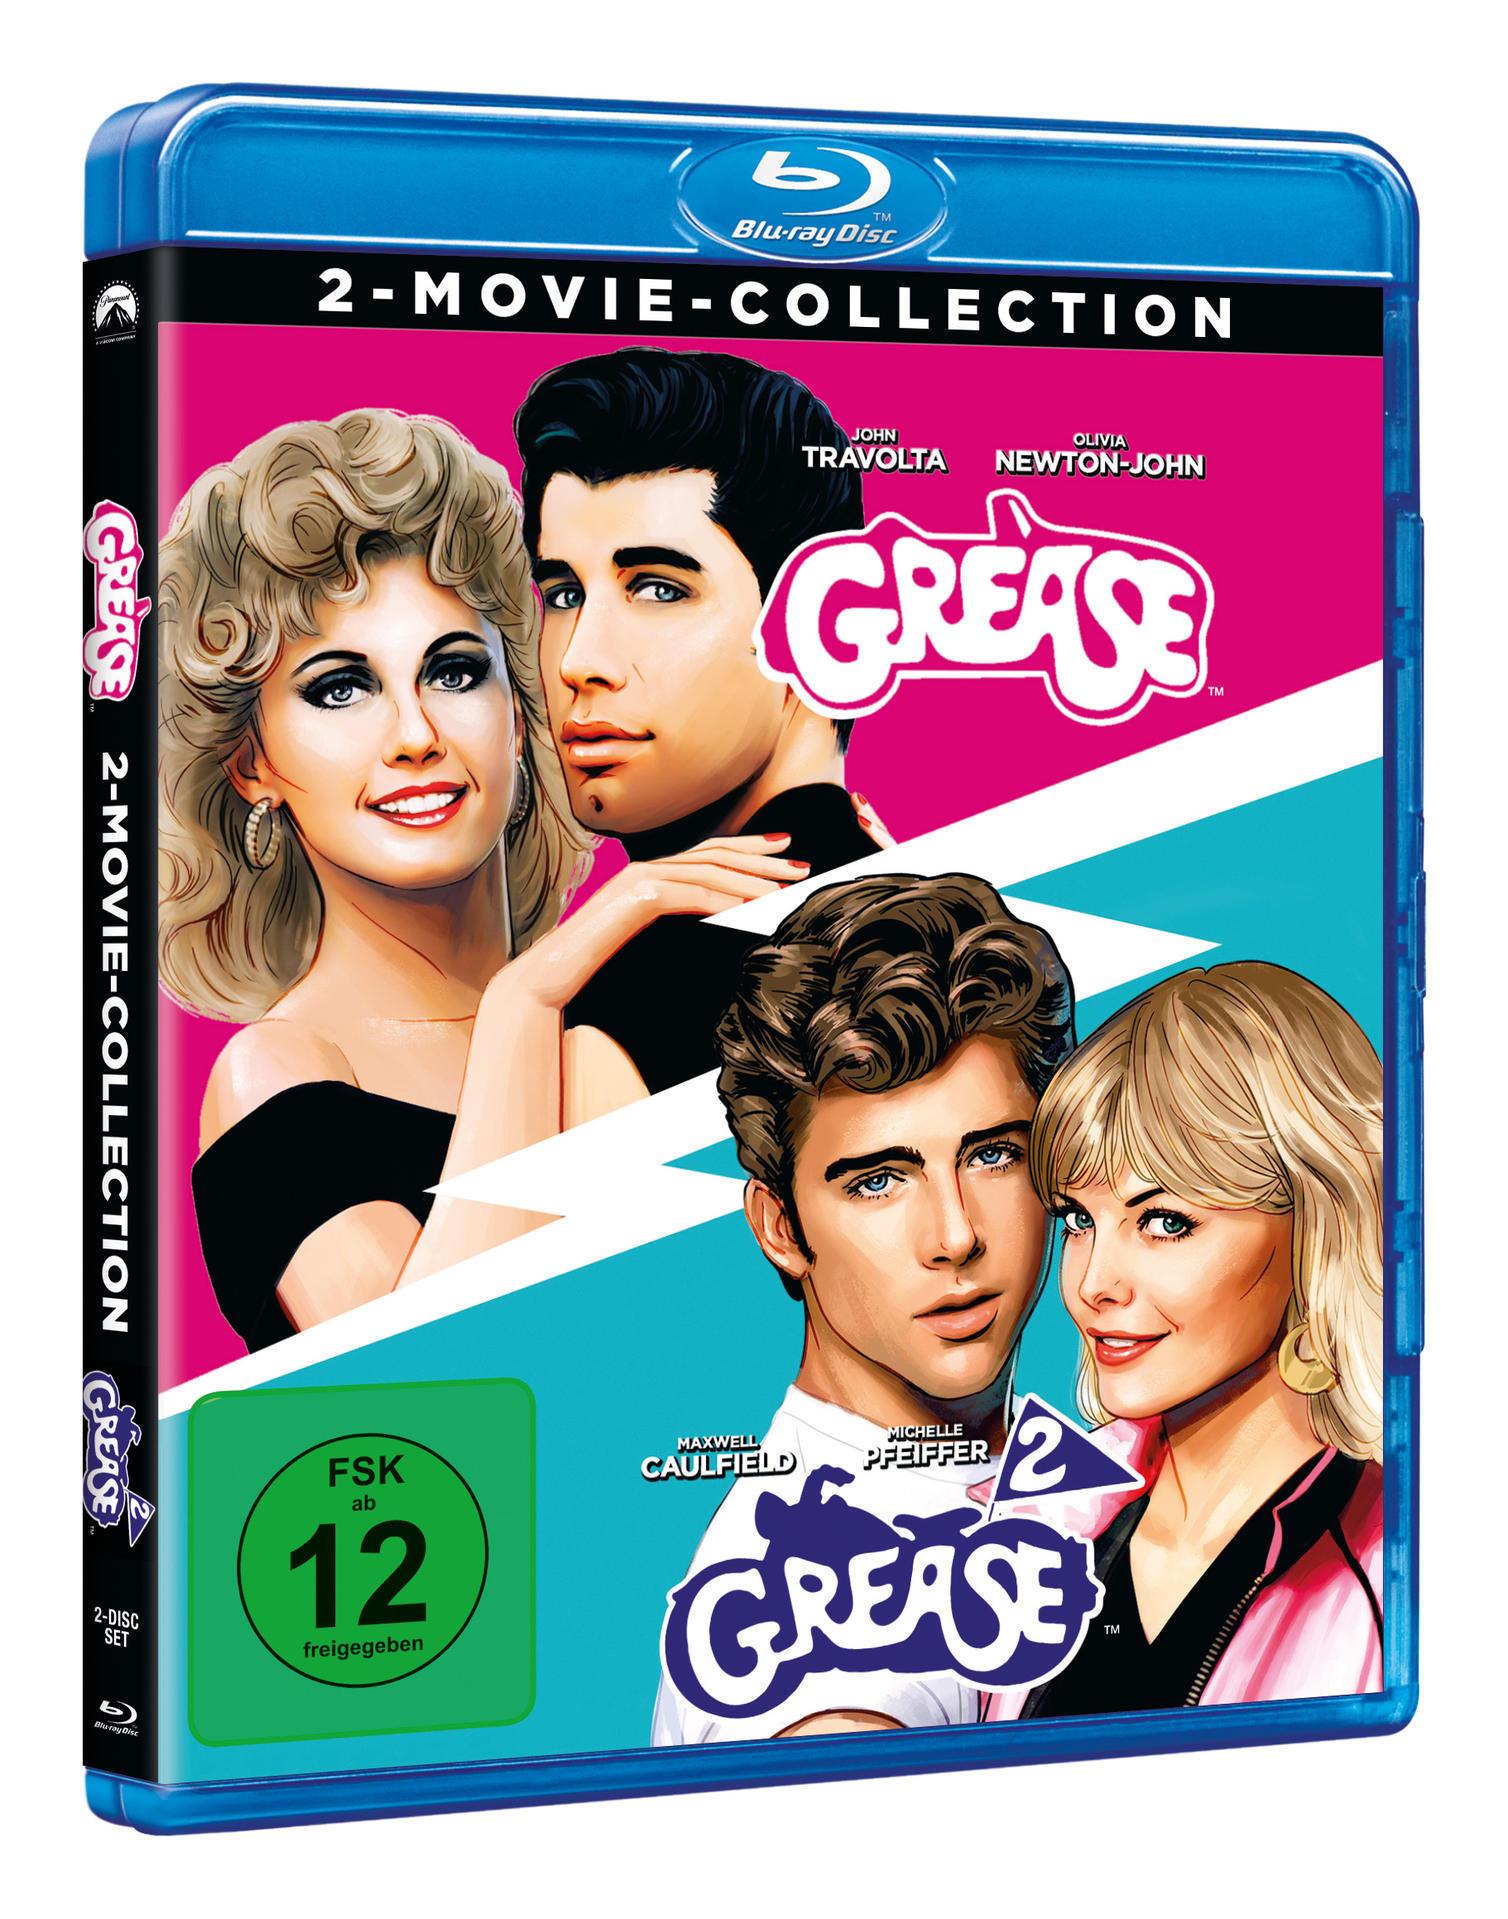 Grease + Grease 2 - 2 Disc Bluray (BLU-RAY) für 14,61 Euro